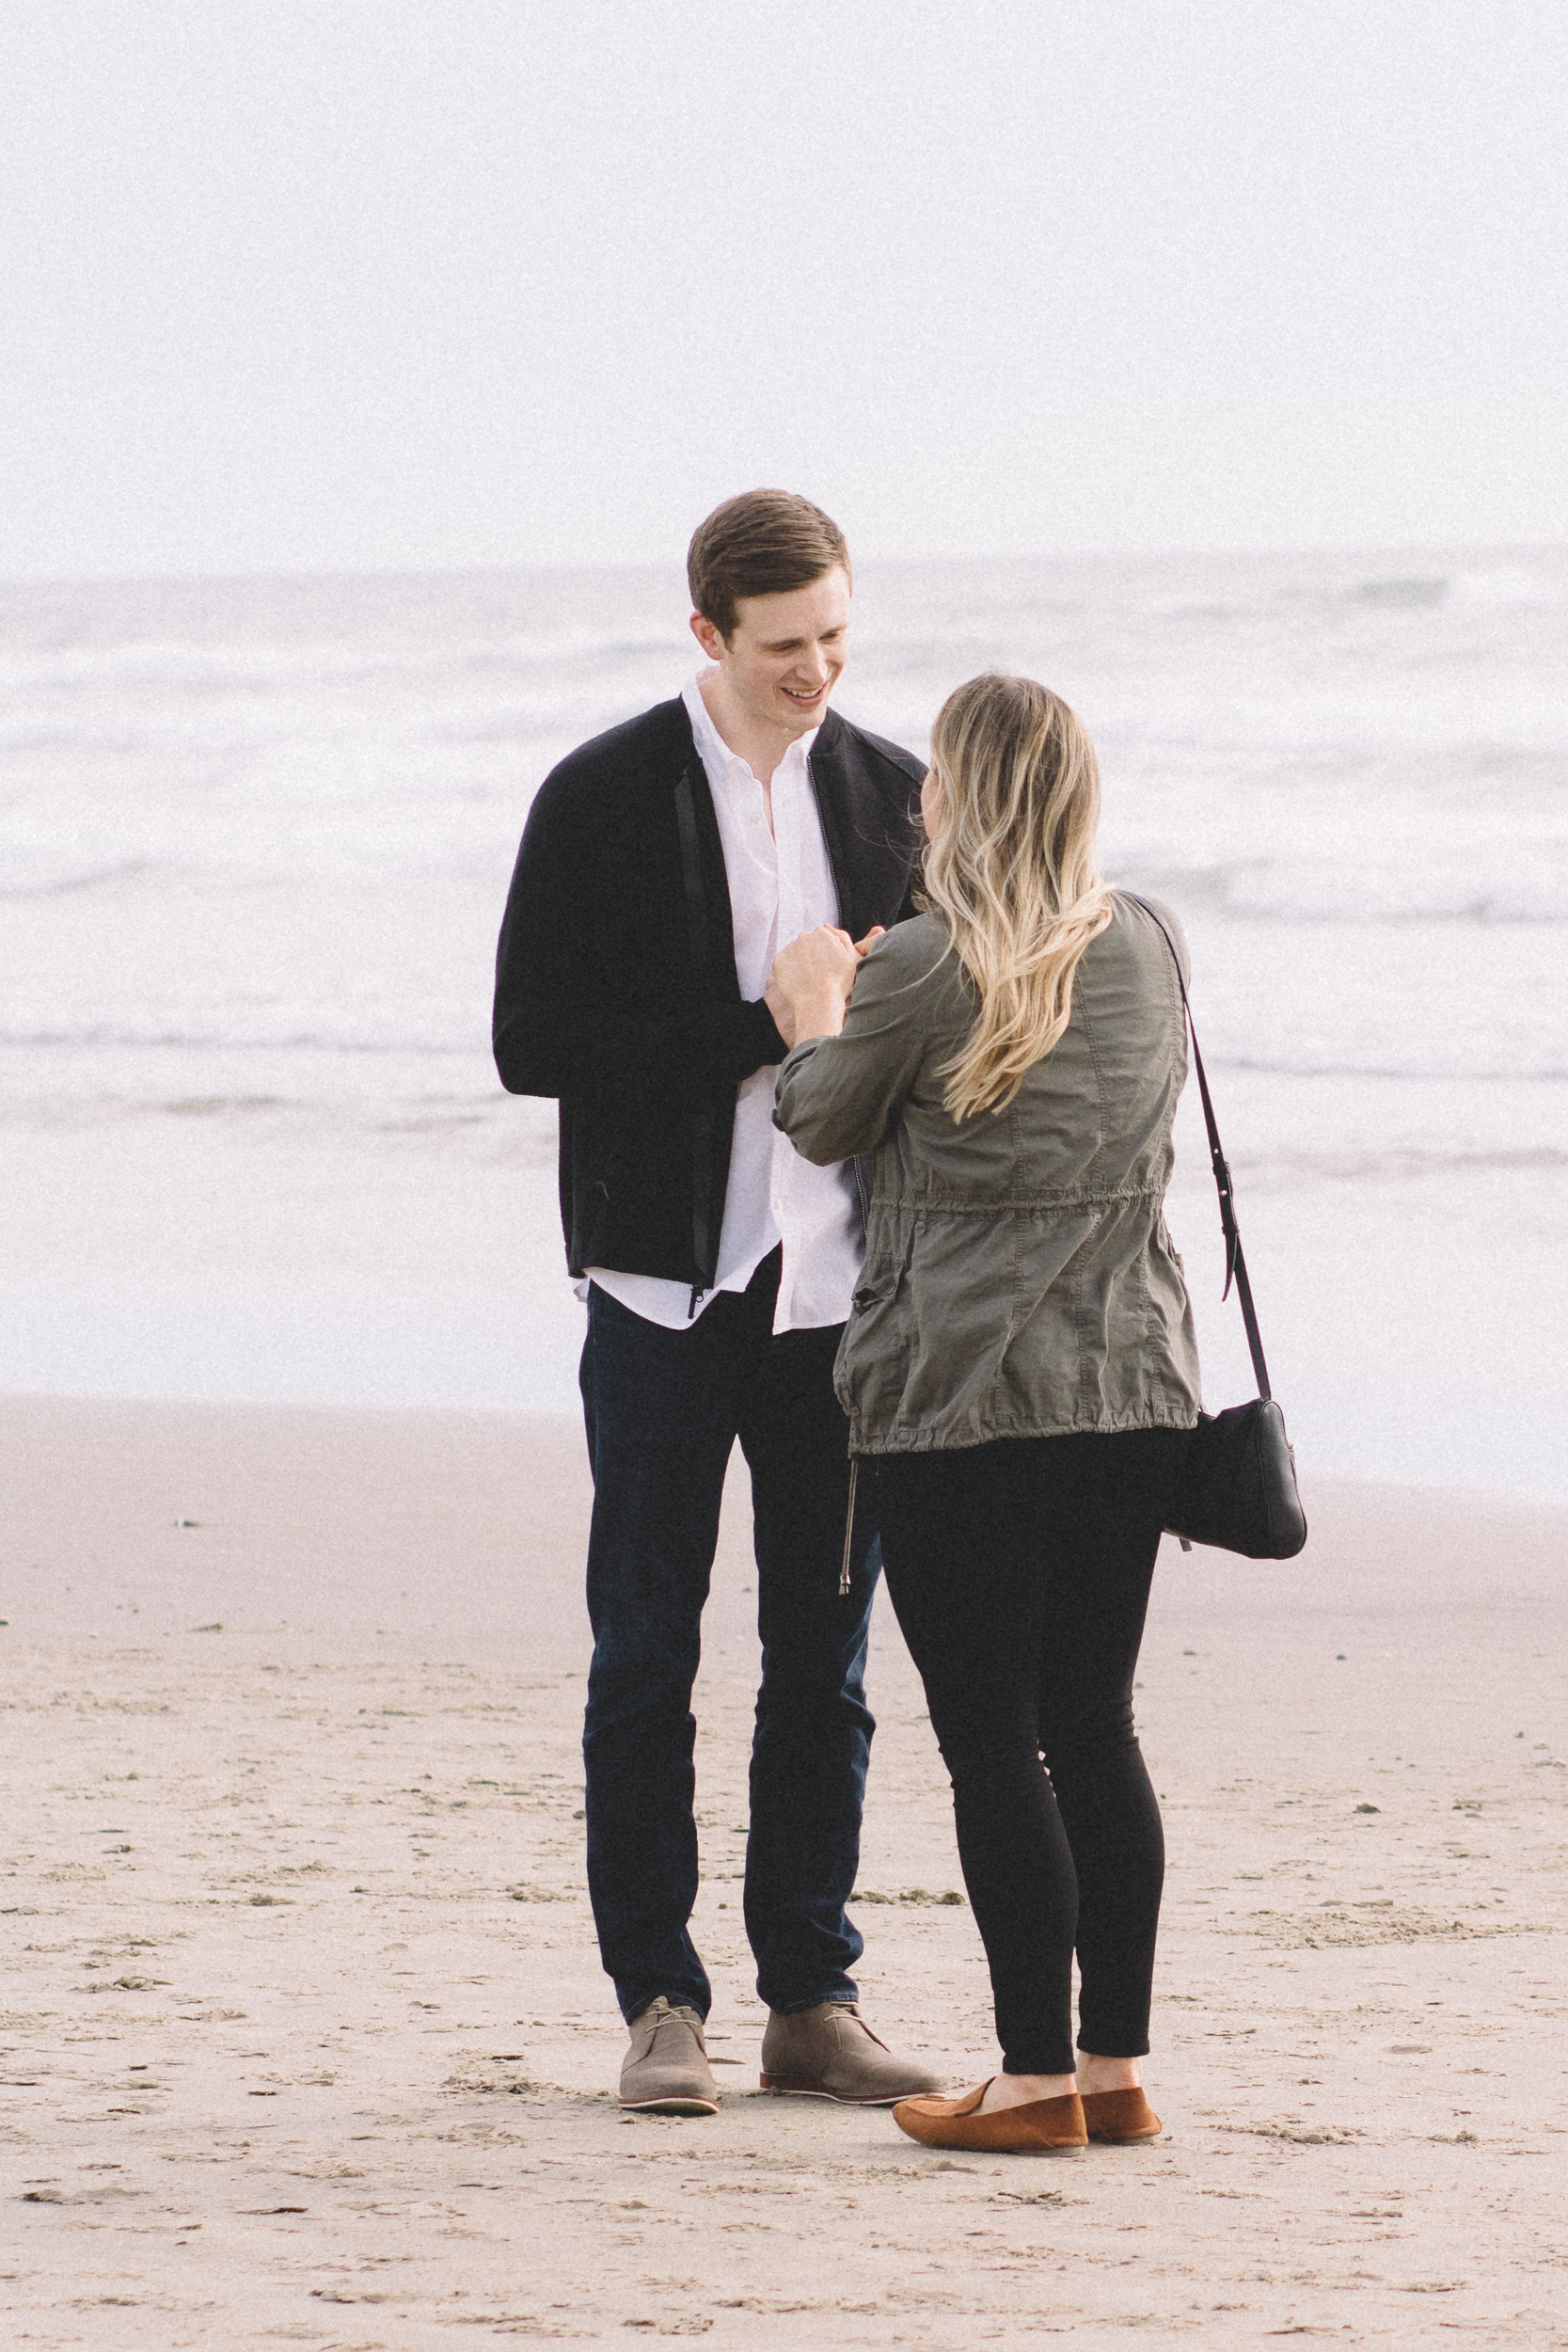 Cannon Beach Proposal Photography-6.jpg